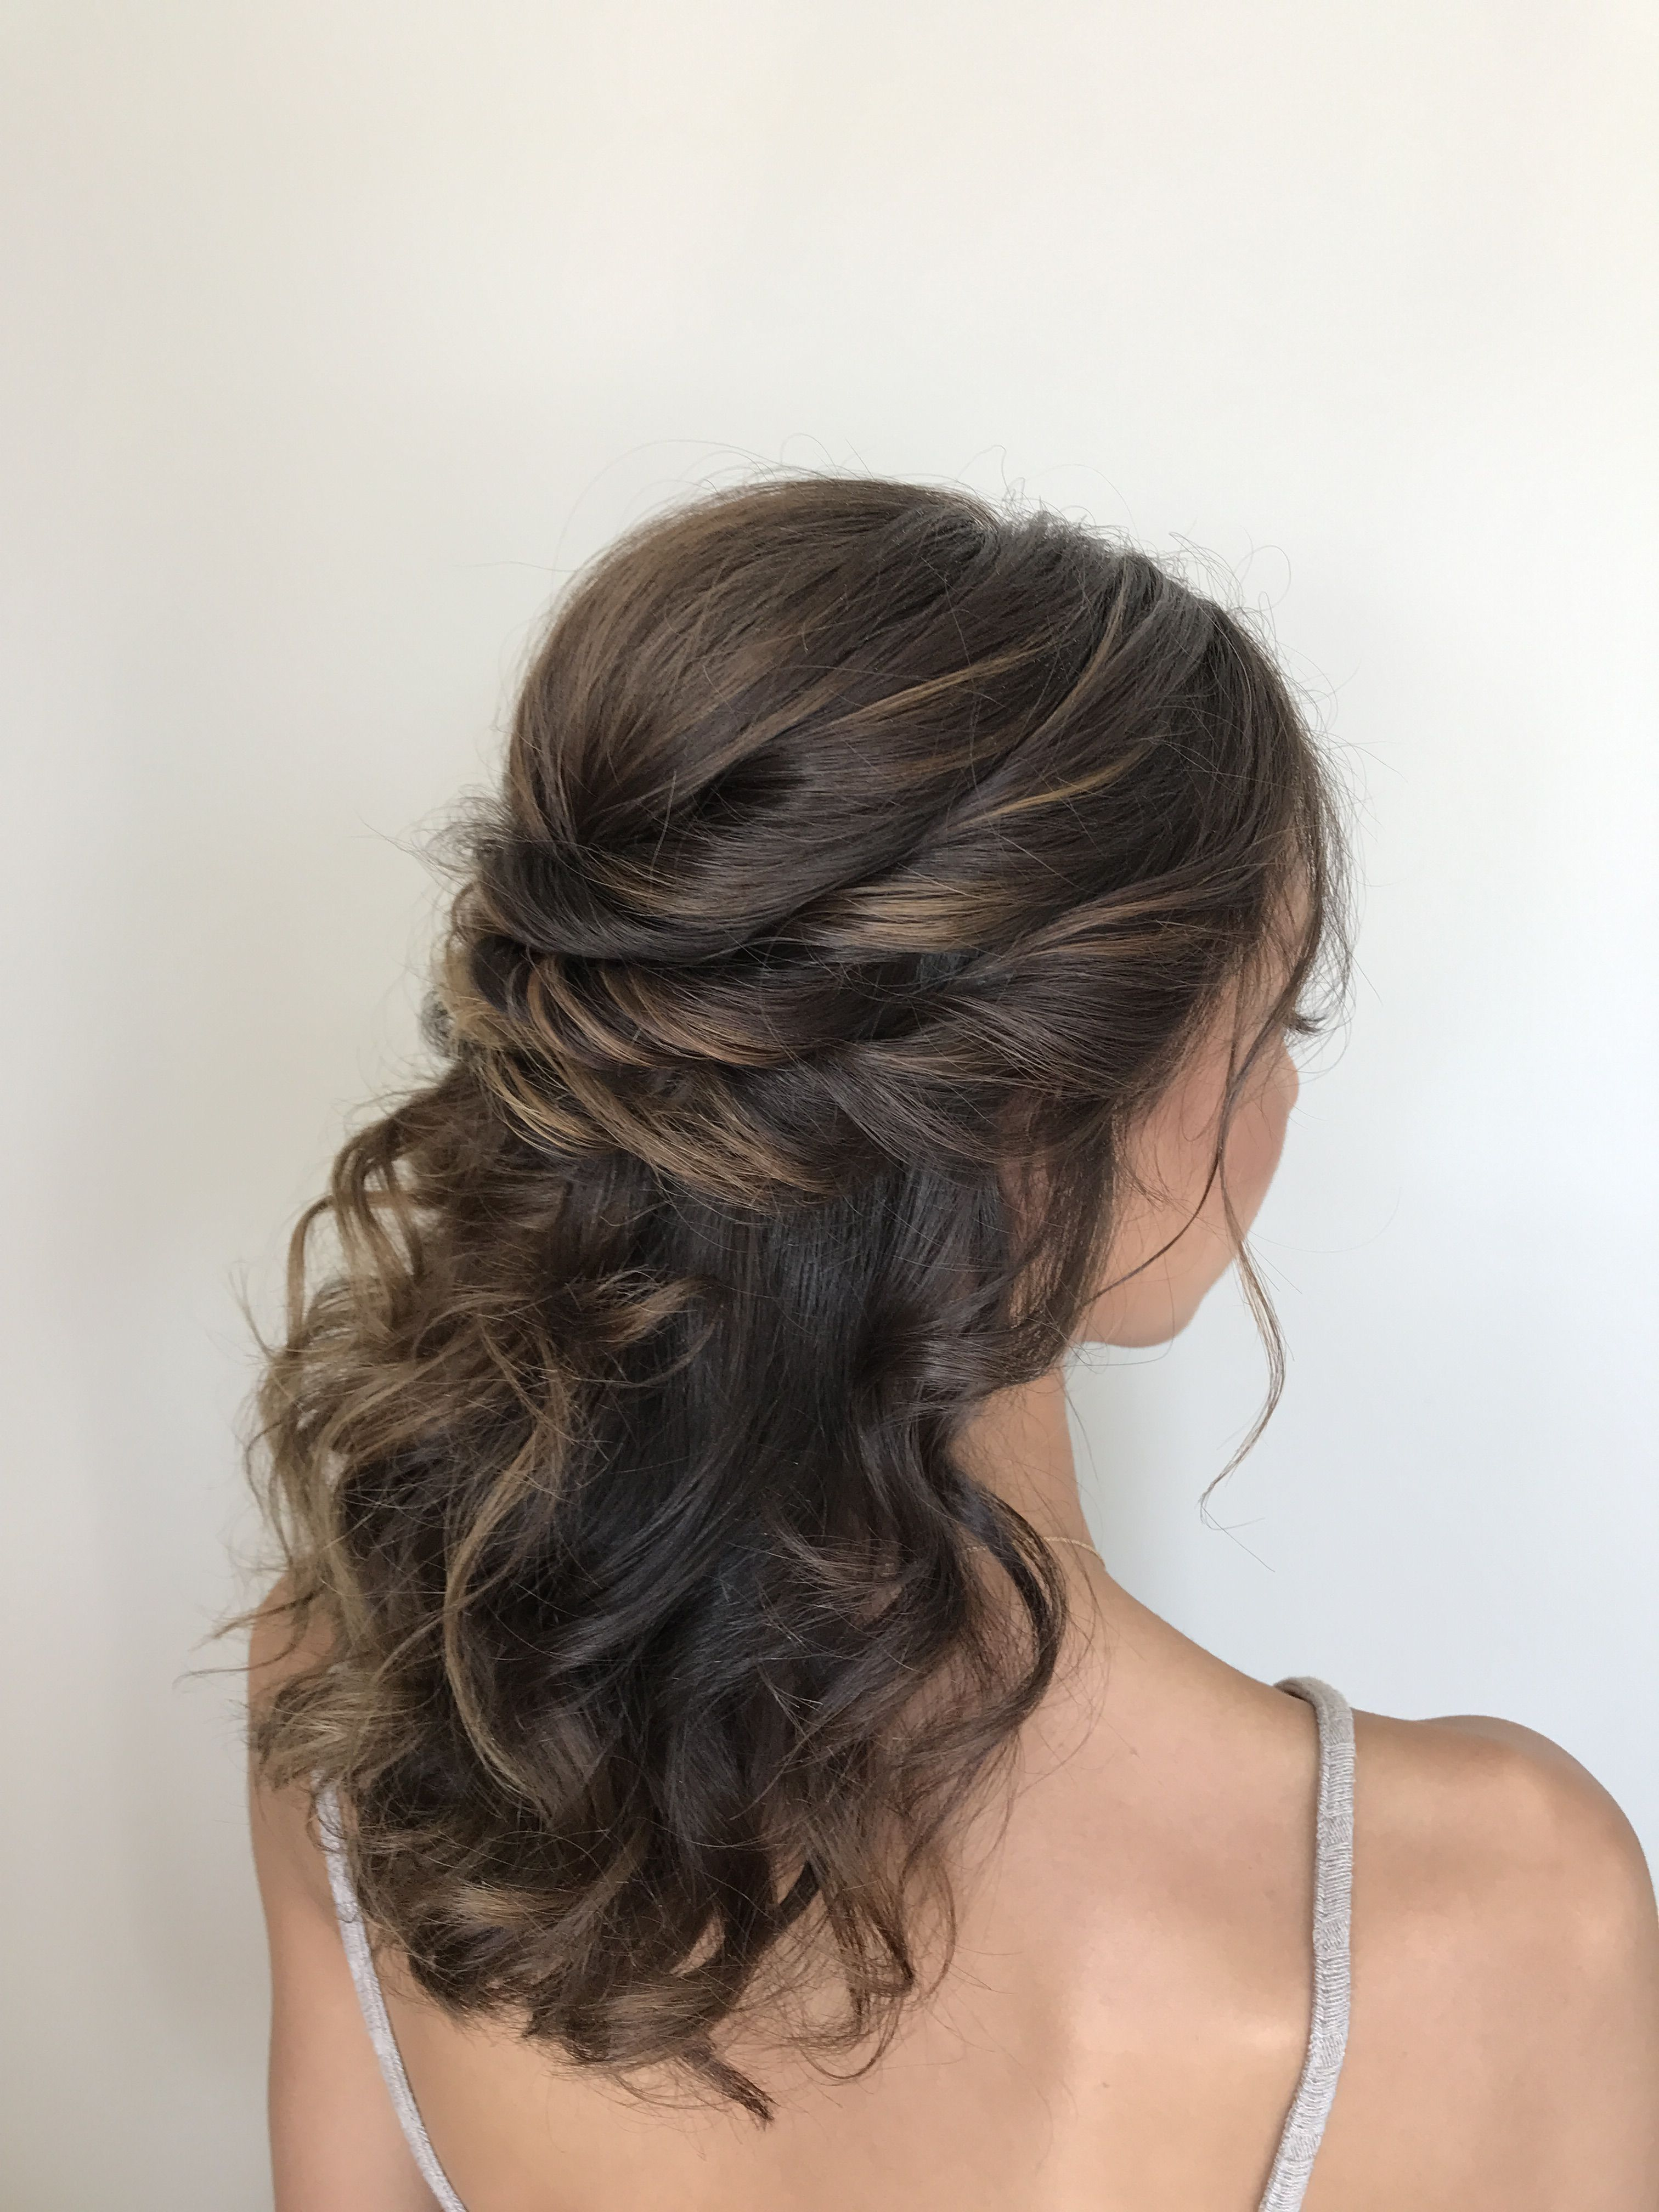 Bridal Hair Half Up Half Down Wedding Hairstyles For Medium Hair